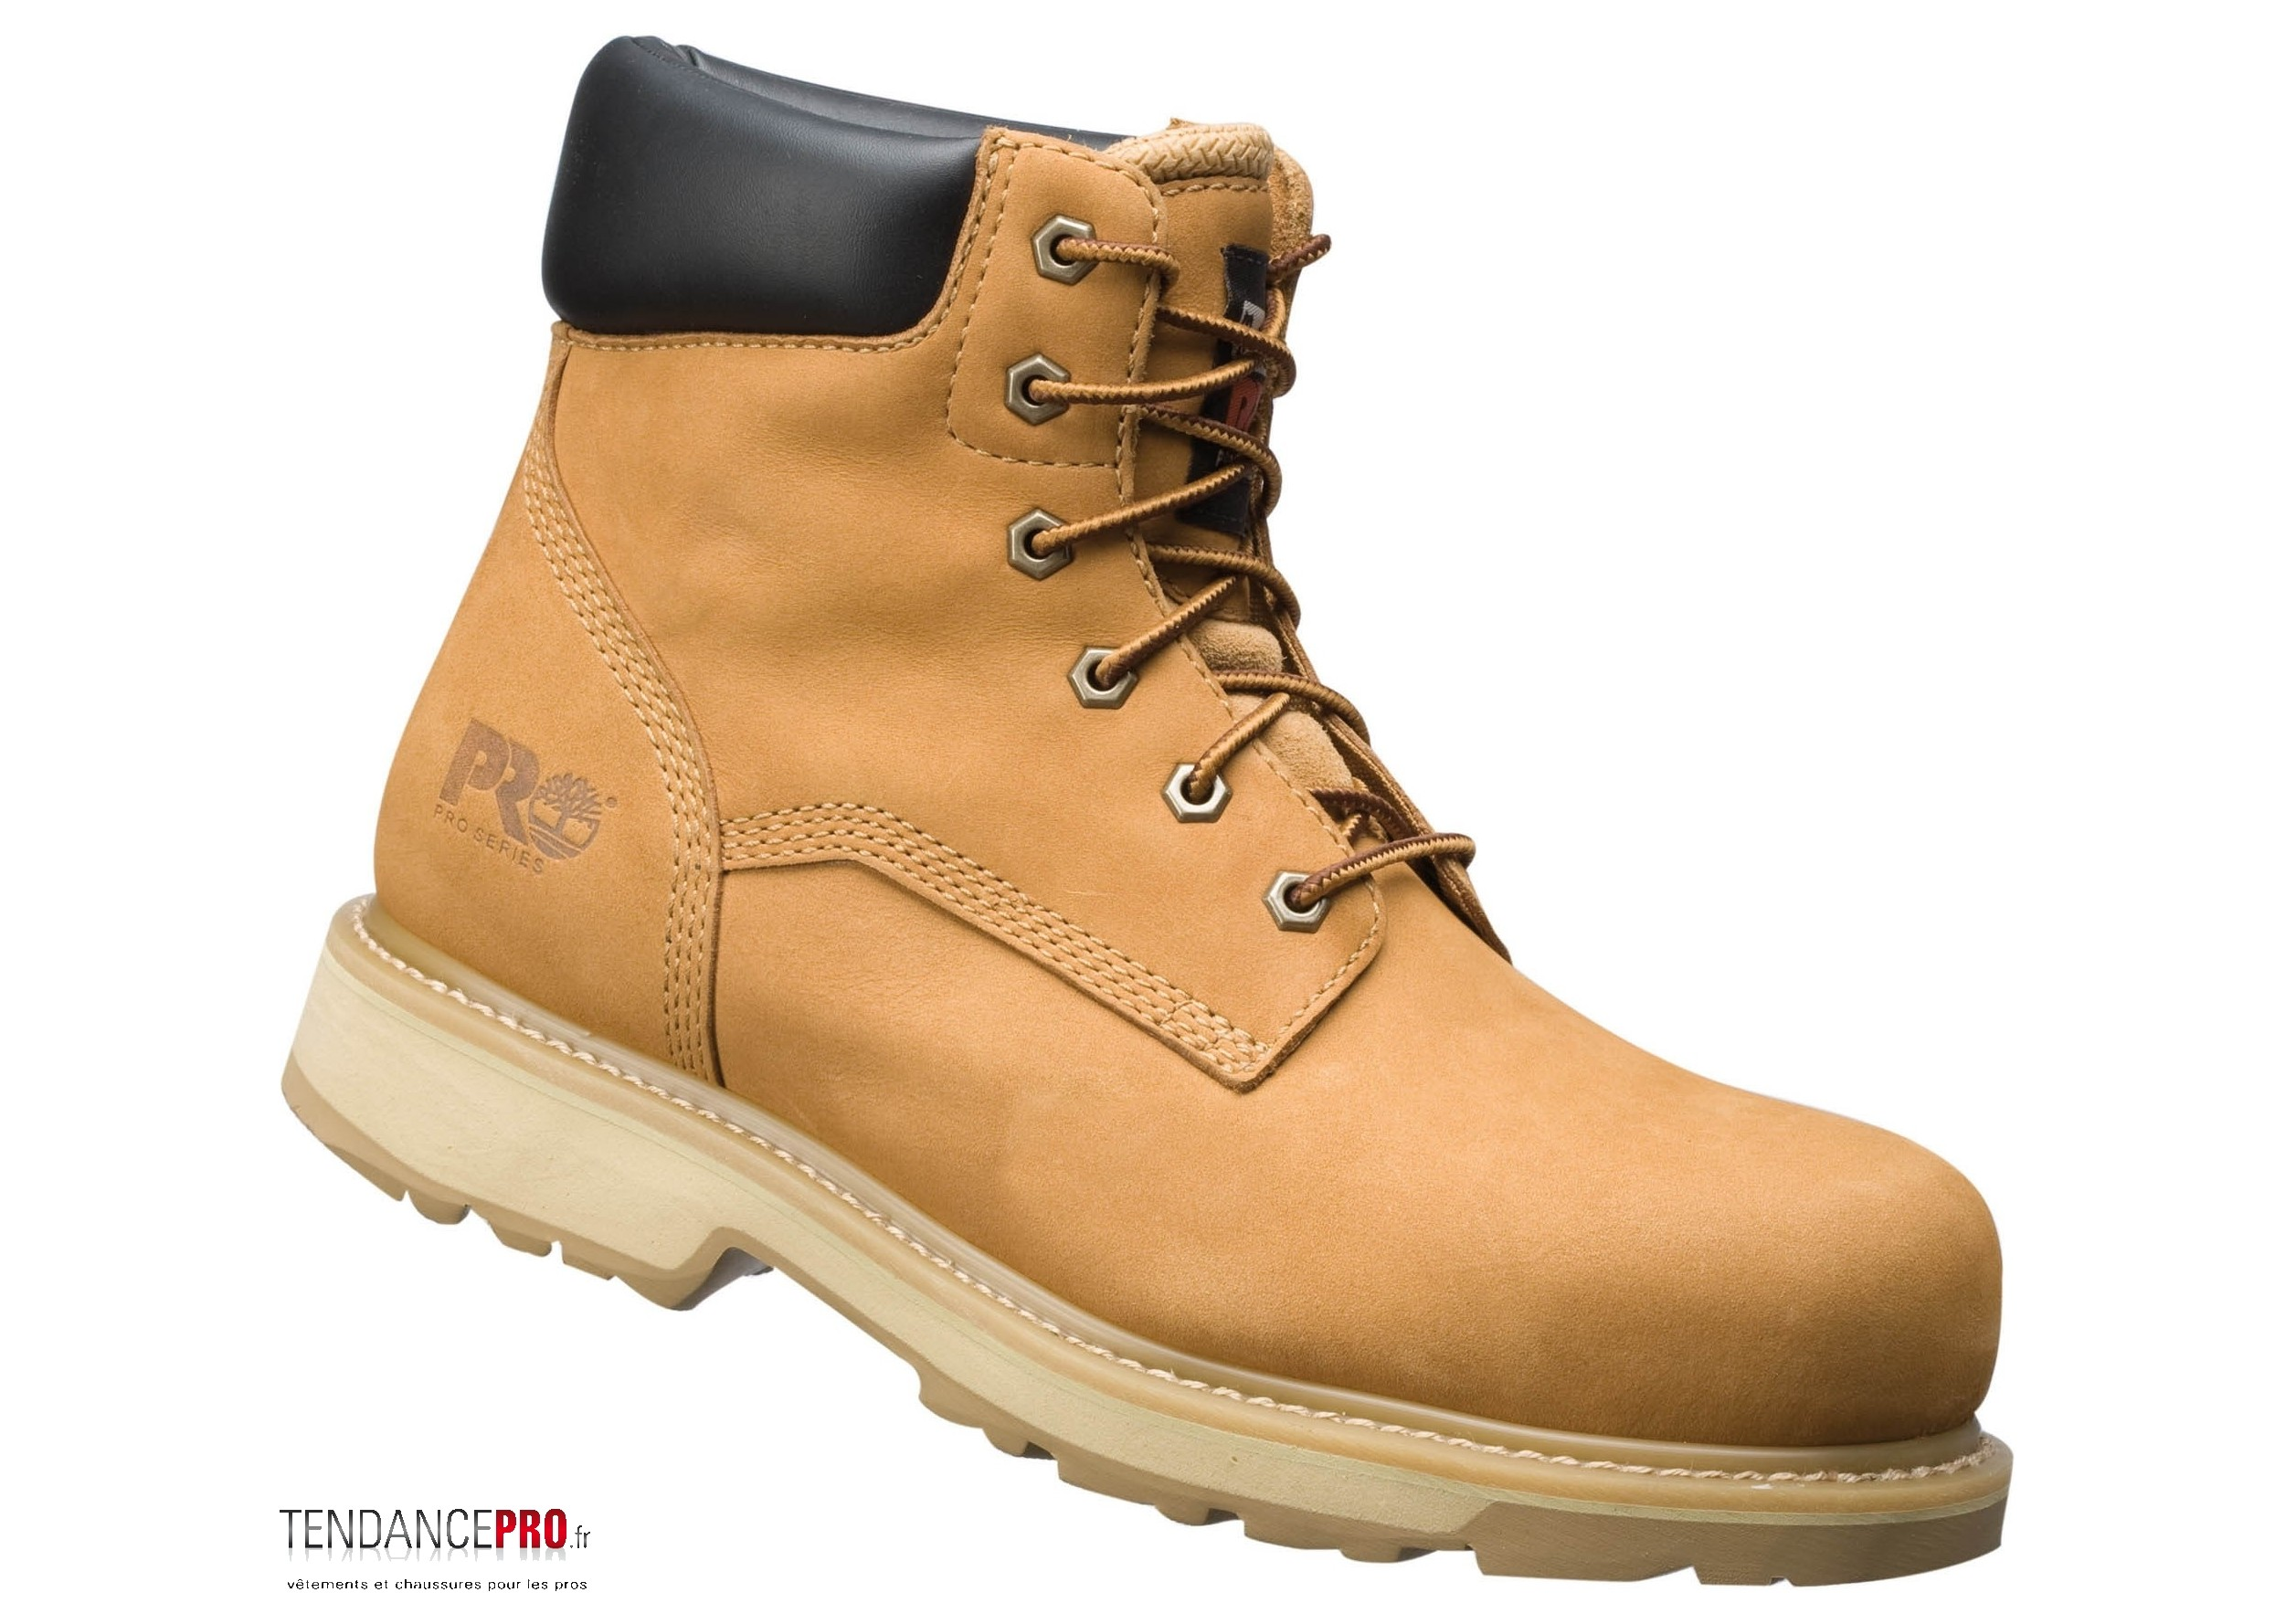 2268b5fd7d240 Correspondance taille chaussures hommes - Guide des tailles Ann Tuil 55  Stage Ek Mount Hope Leather and Fabric Waterproof, Bottes de neige  femmeMarron (Dark